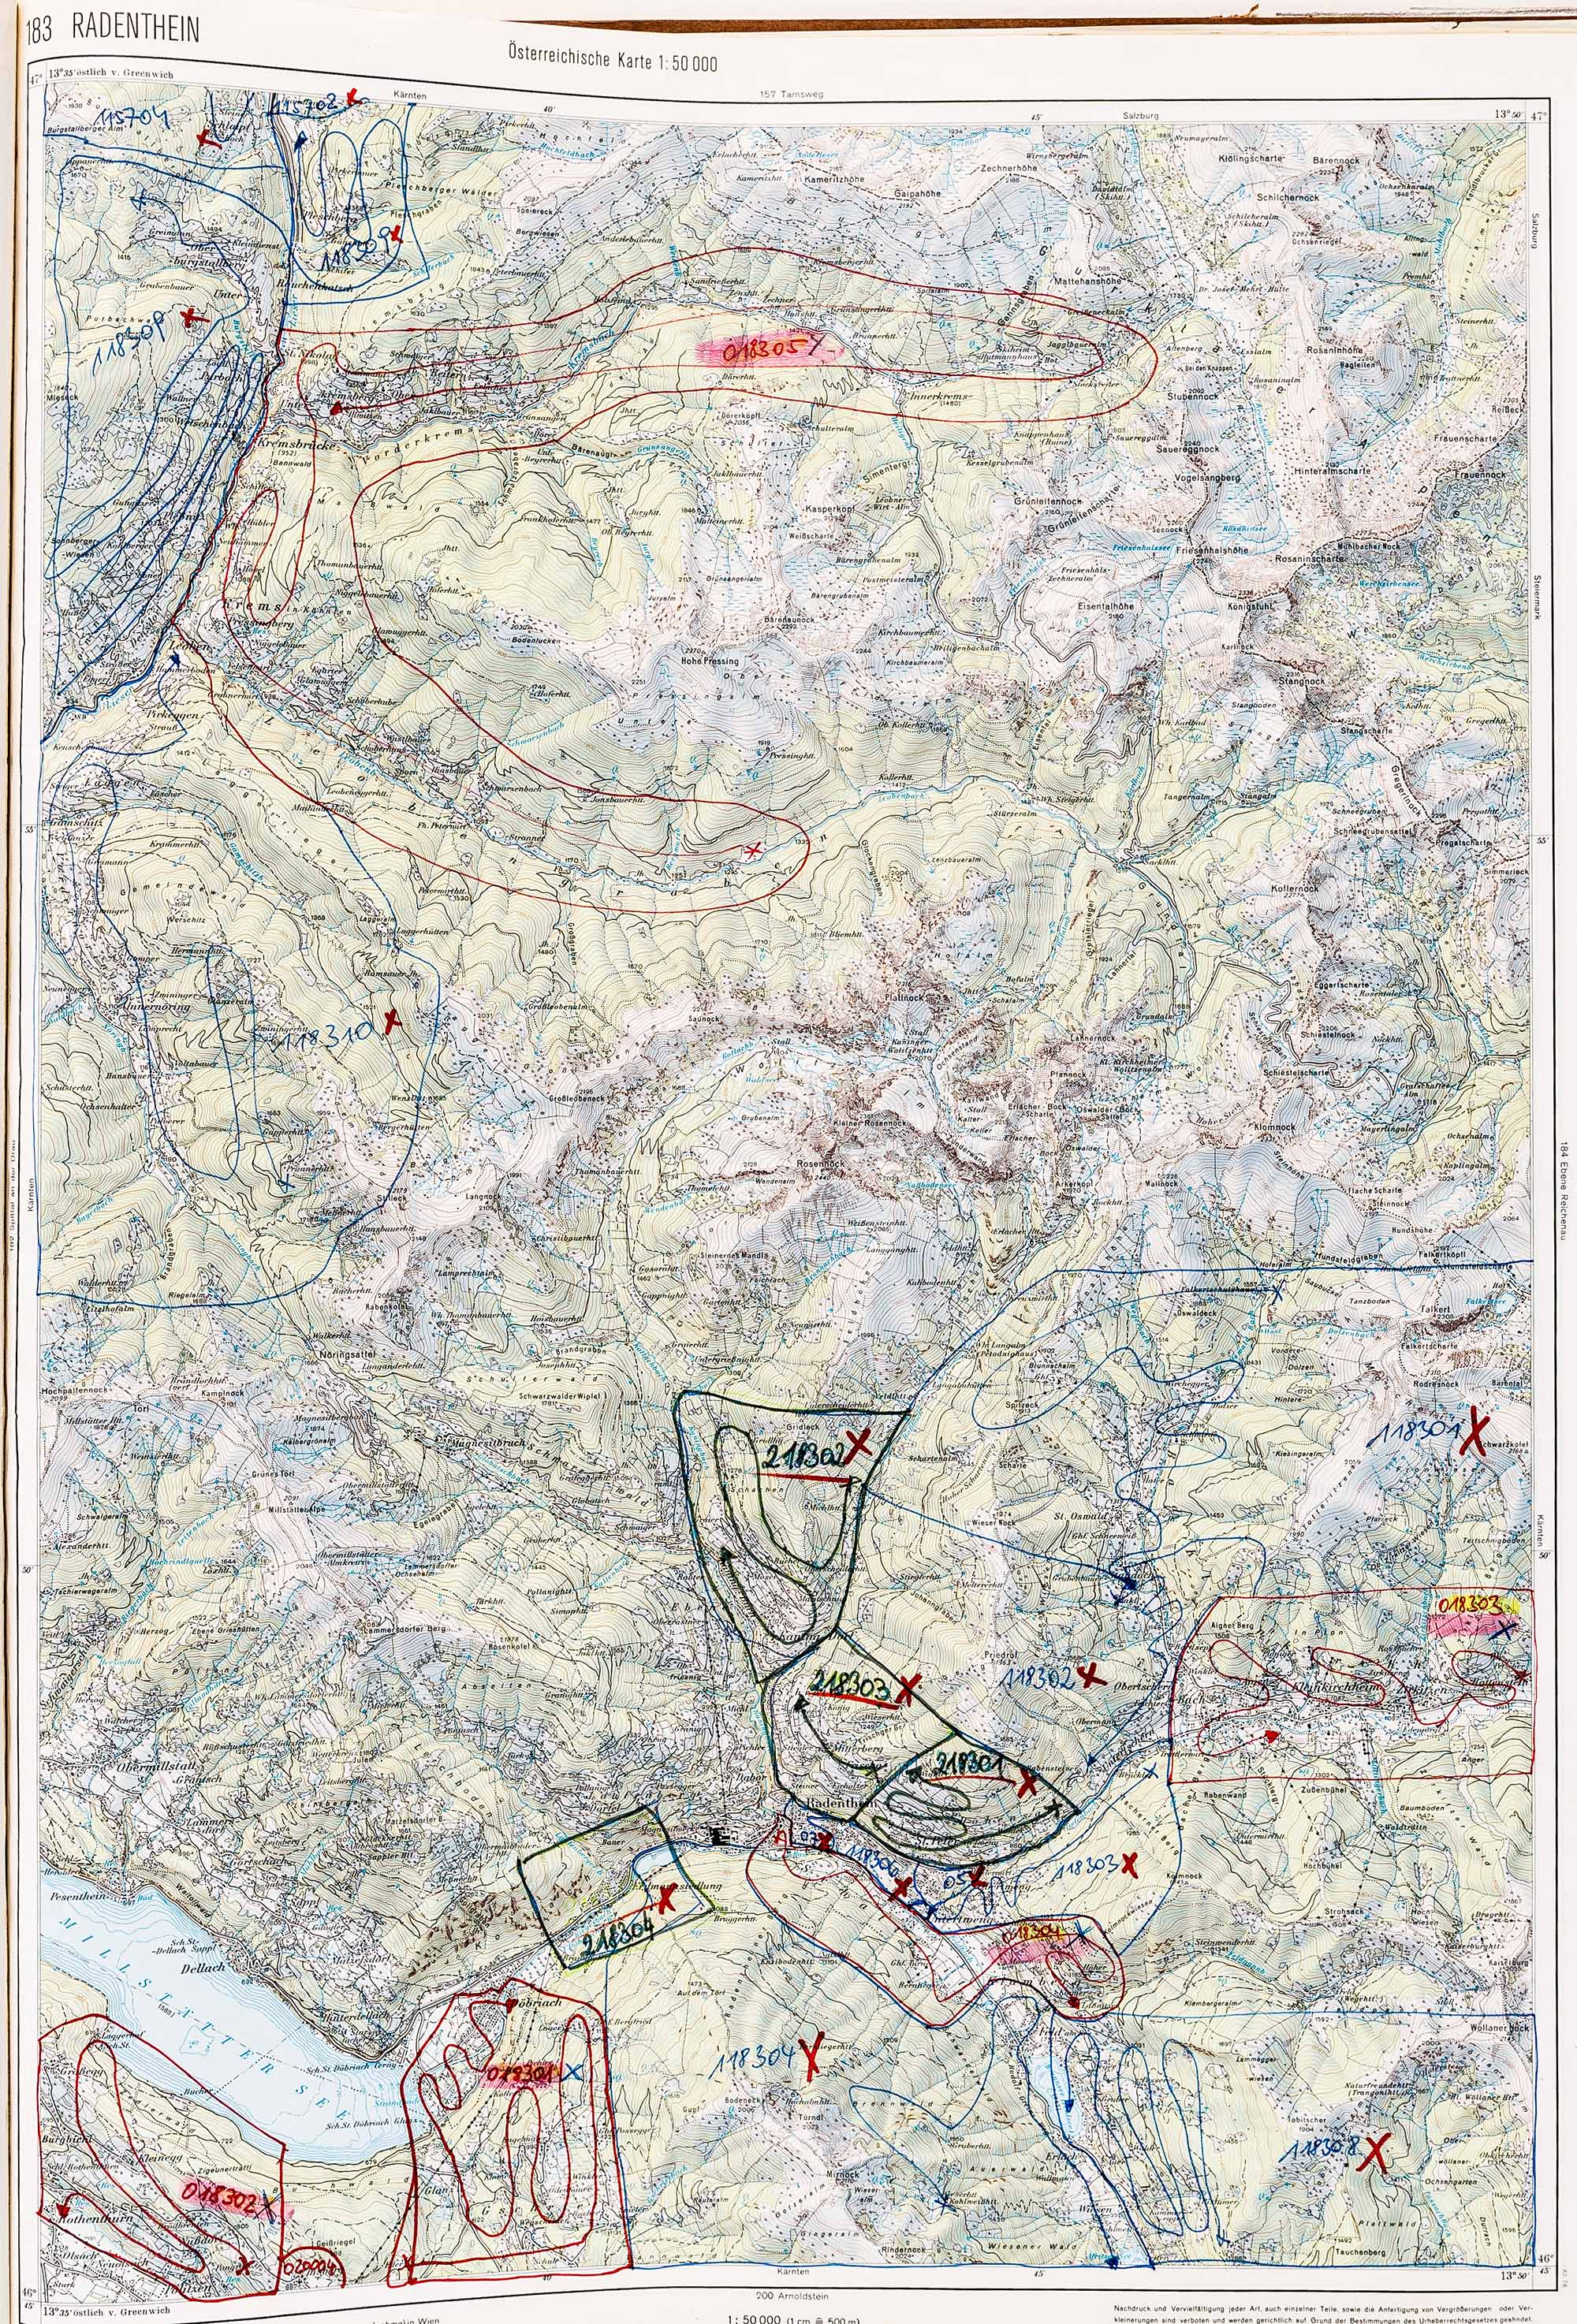 1979-1982 Karte 183